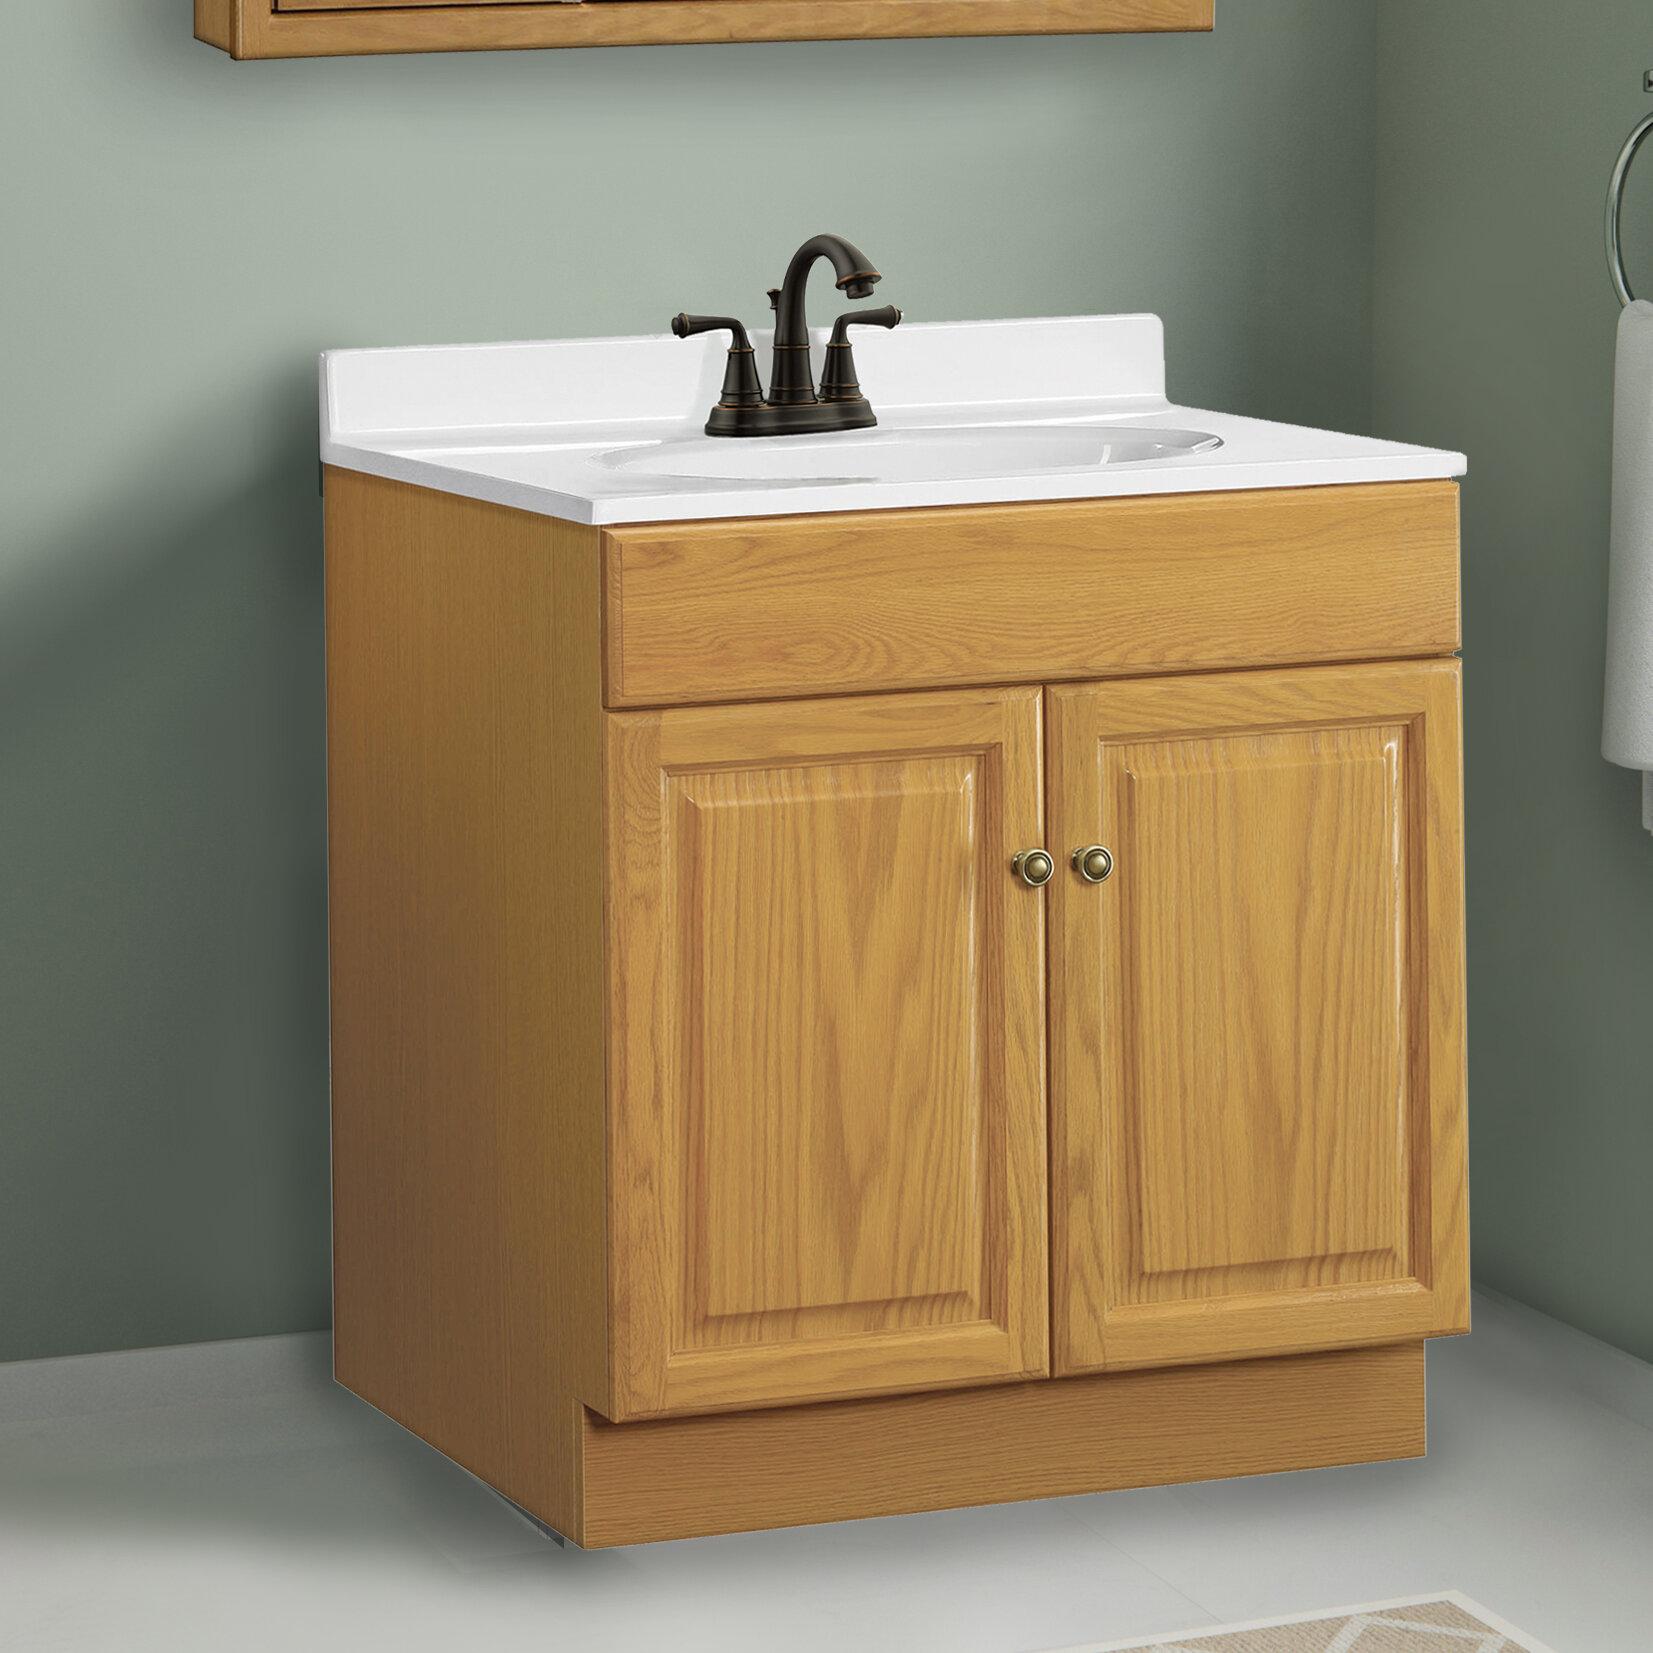 Details About Winston Porter Coil 24 Bathroom Vanity Base Only